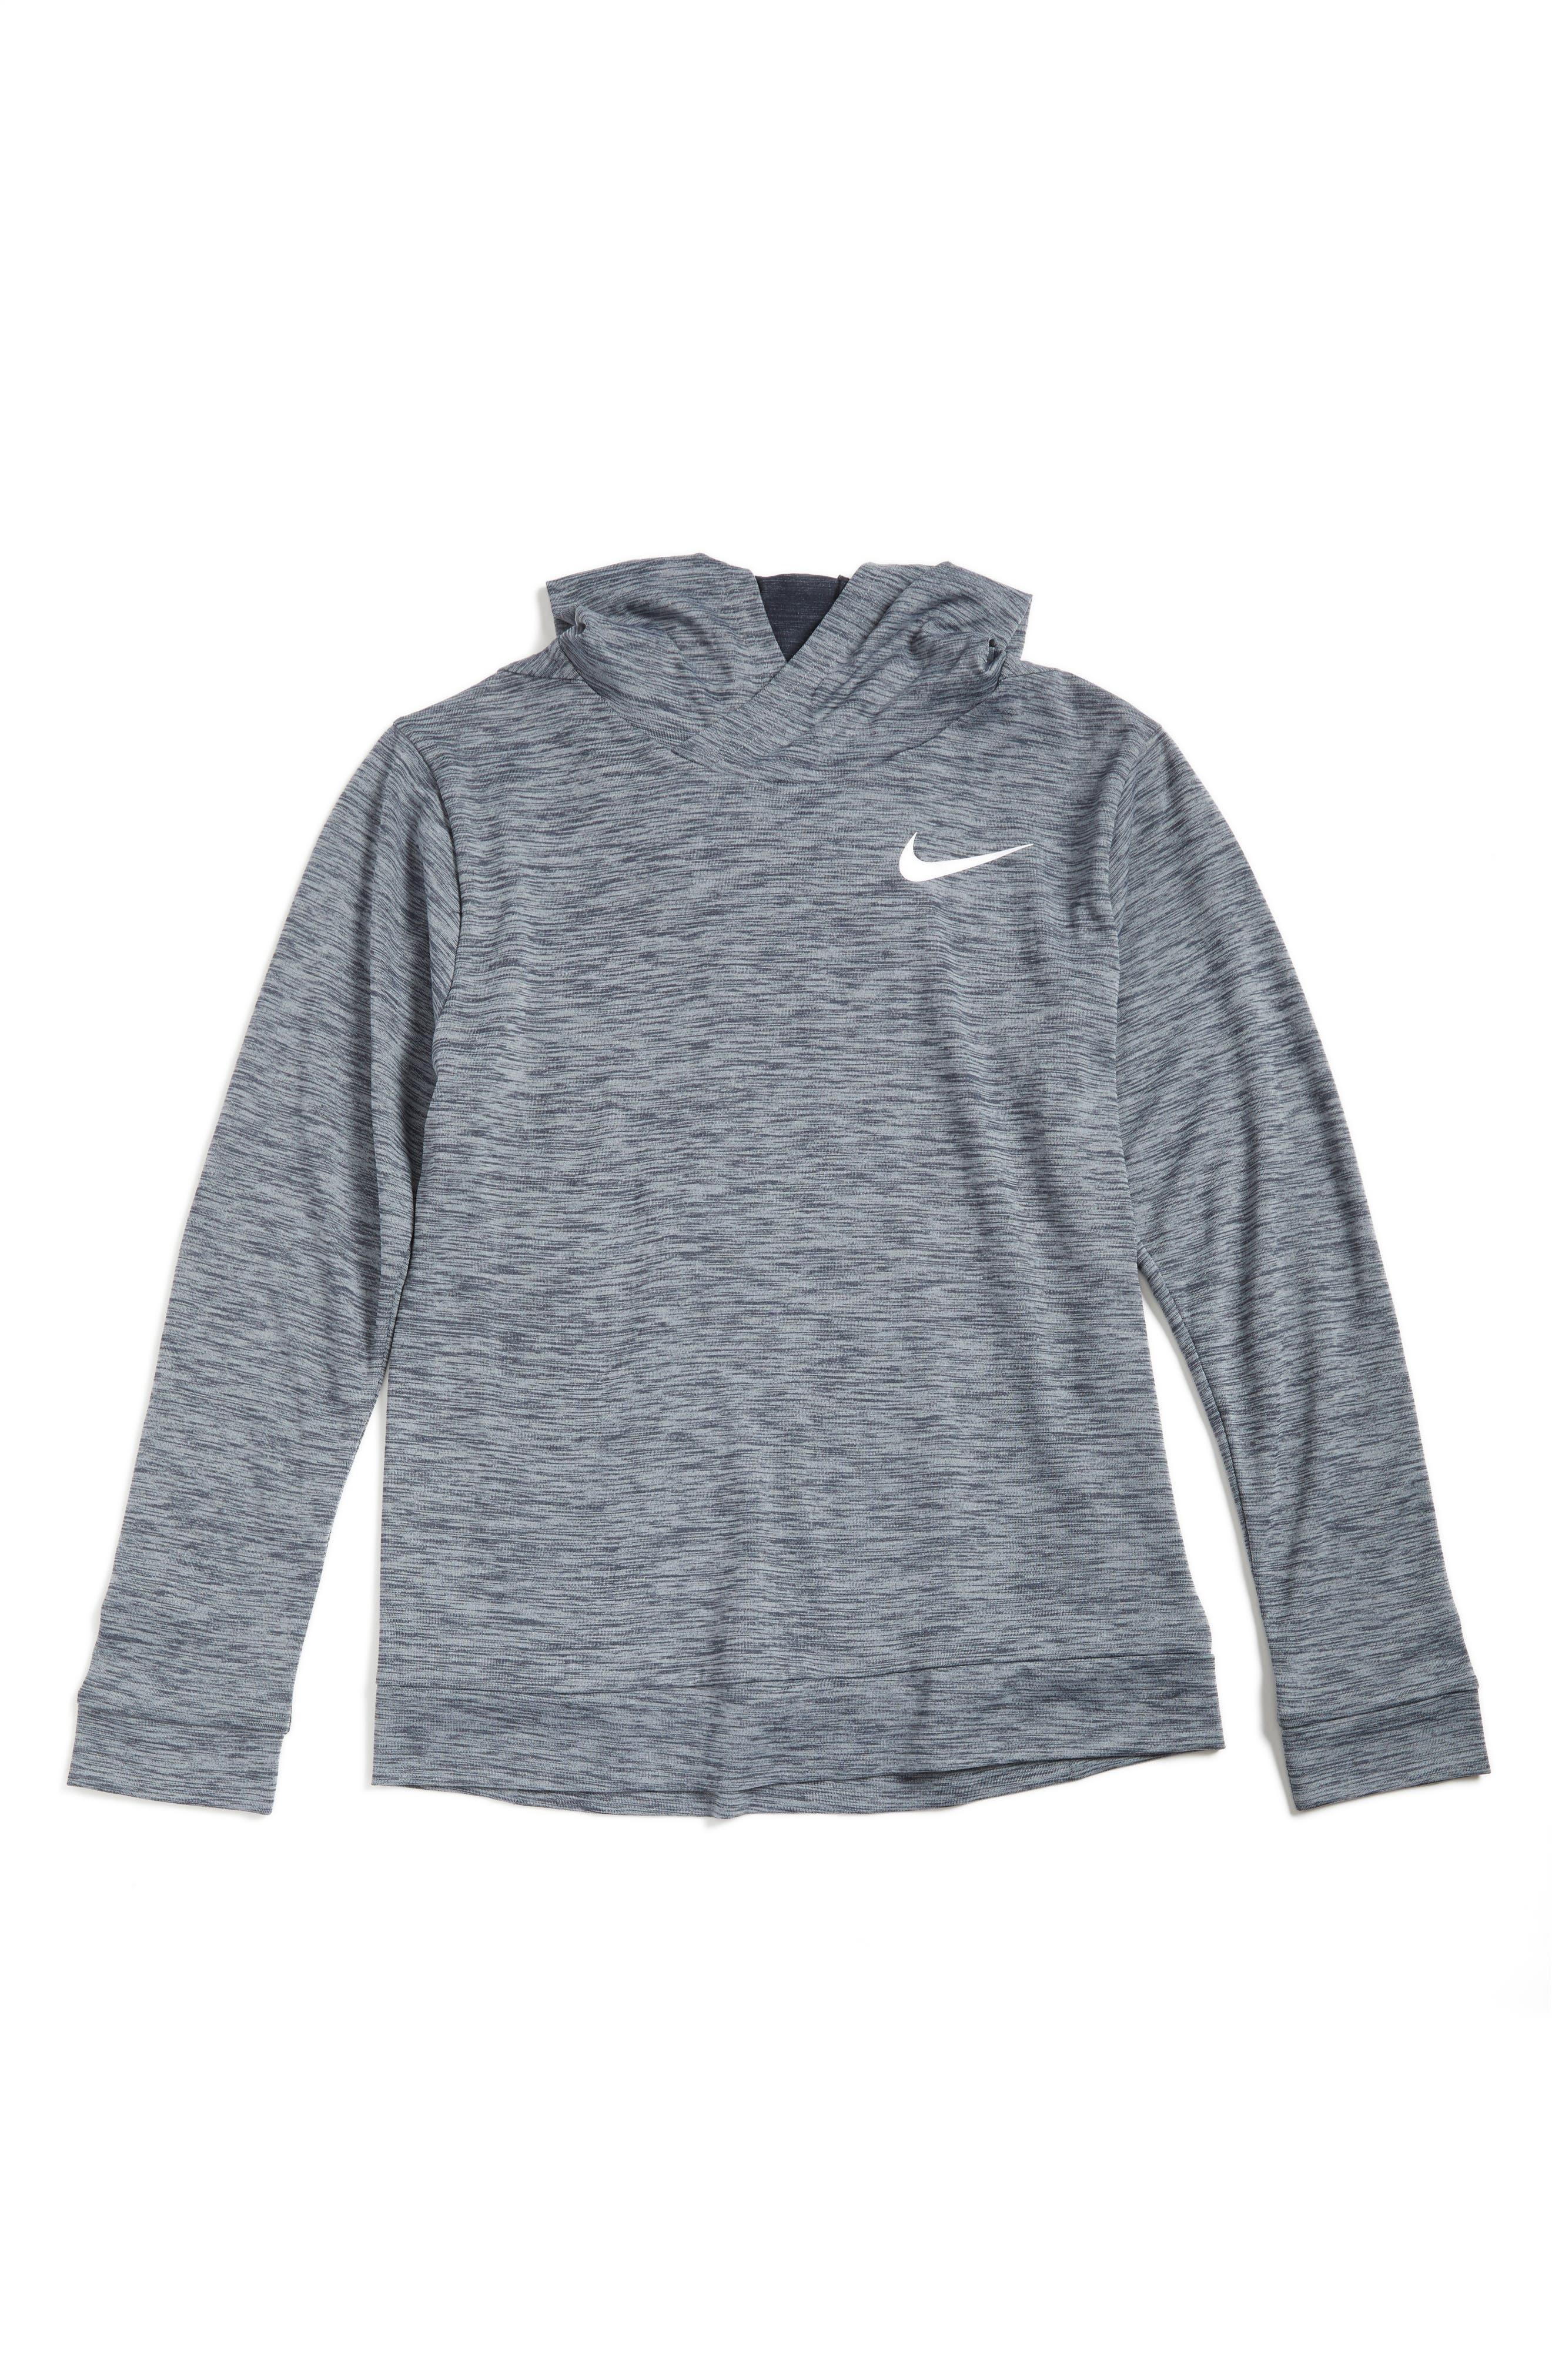 Nike Dri-FIT Training Hooded T-Shirt (Little Boys & Big Boys)